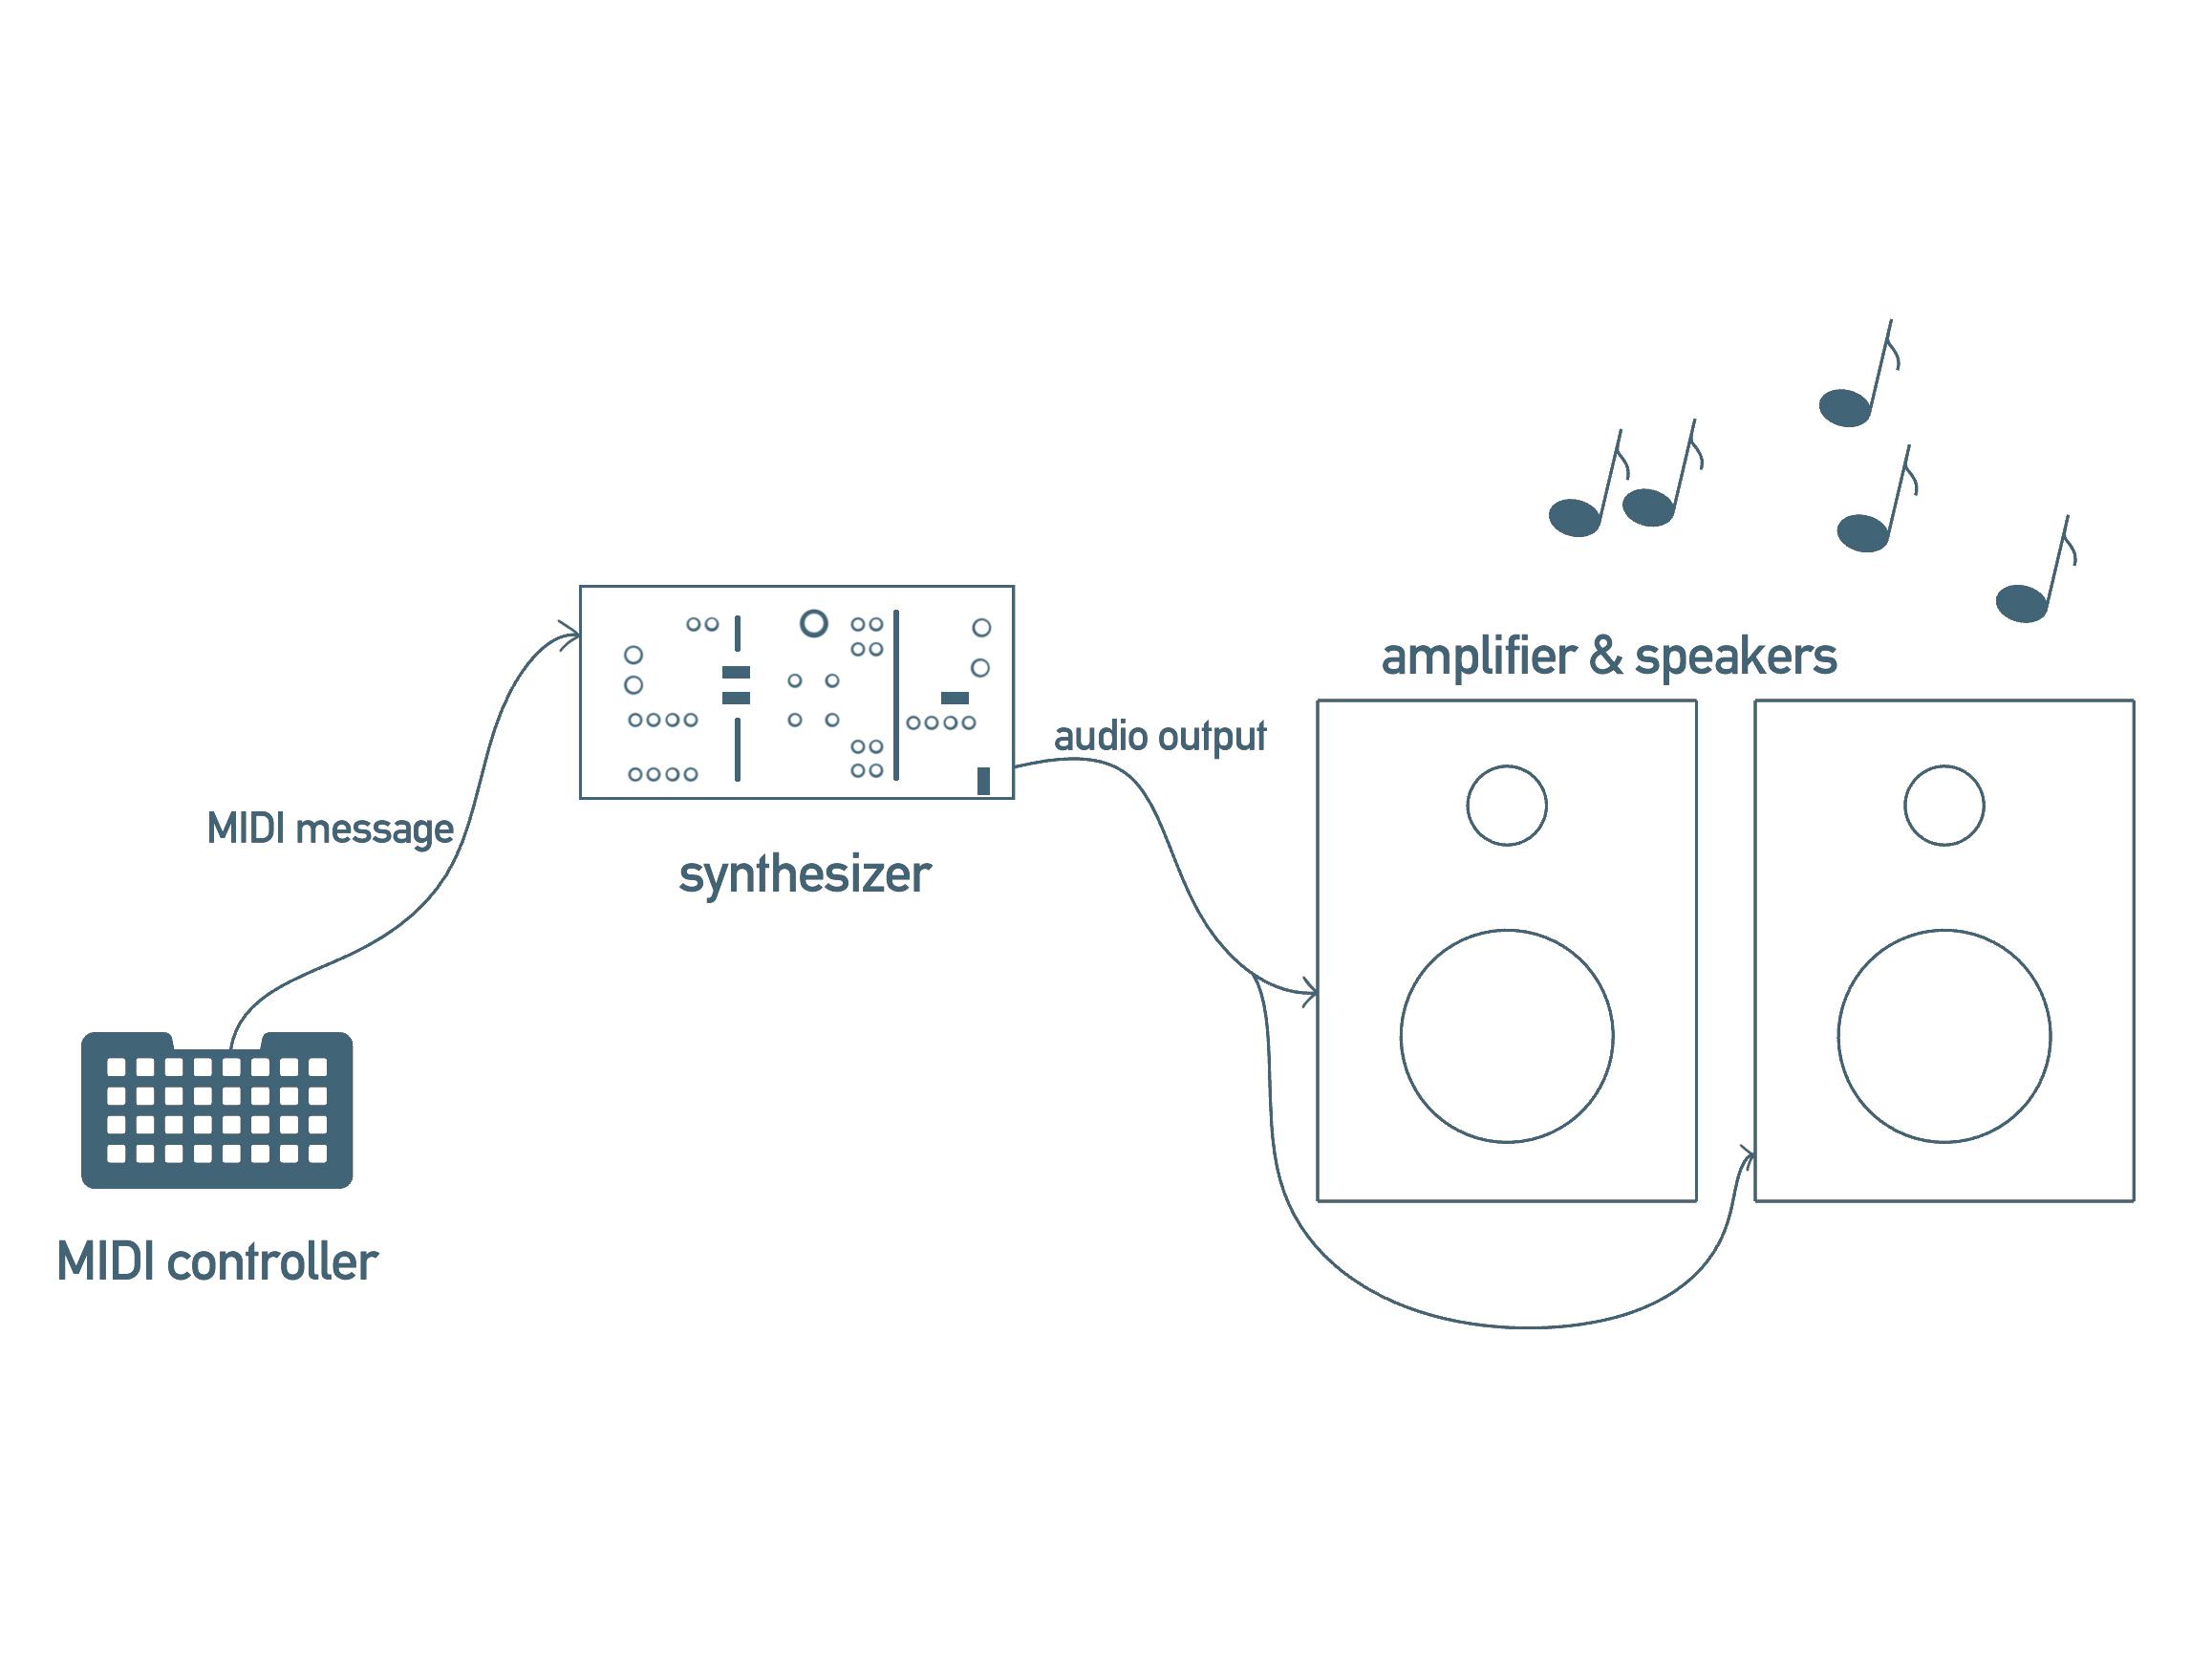 feather_midi_block_diagram.jpg